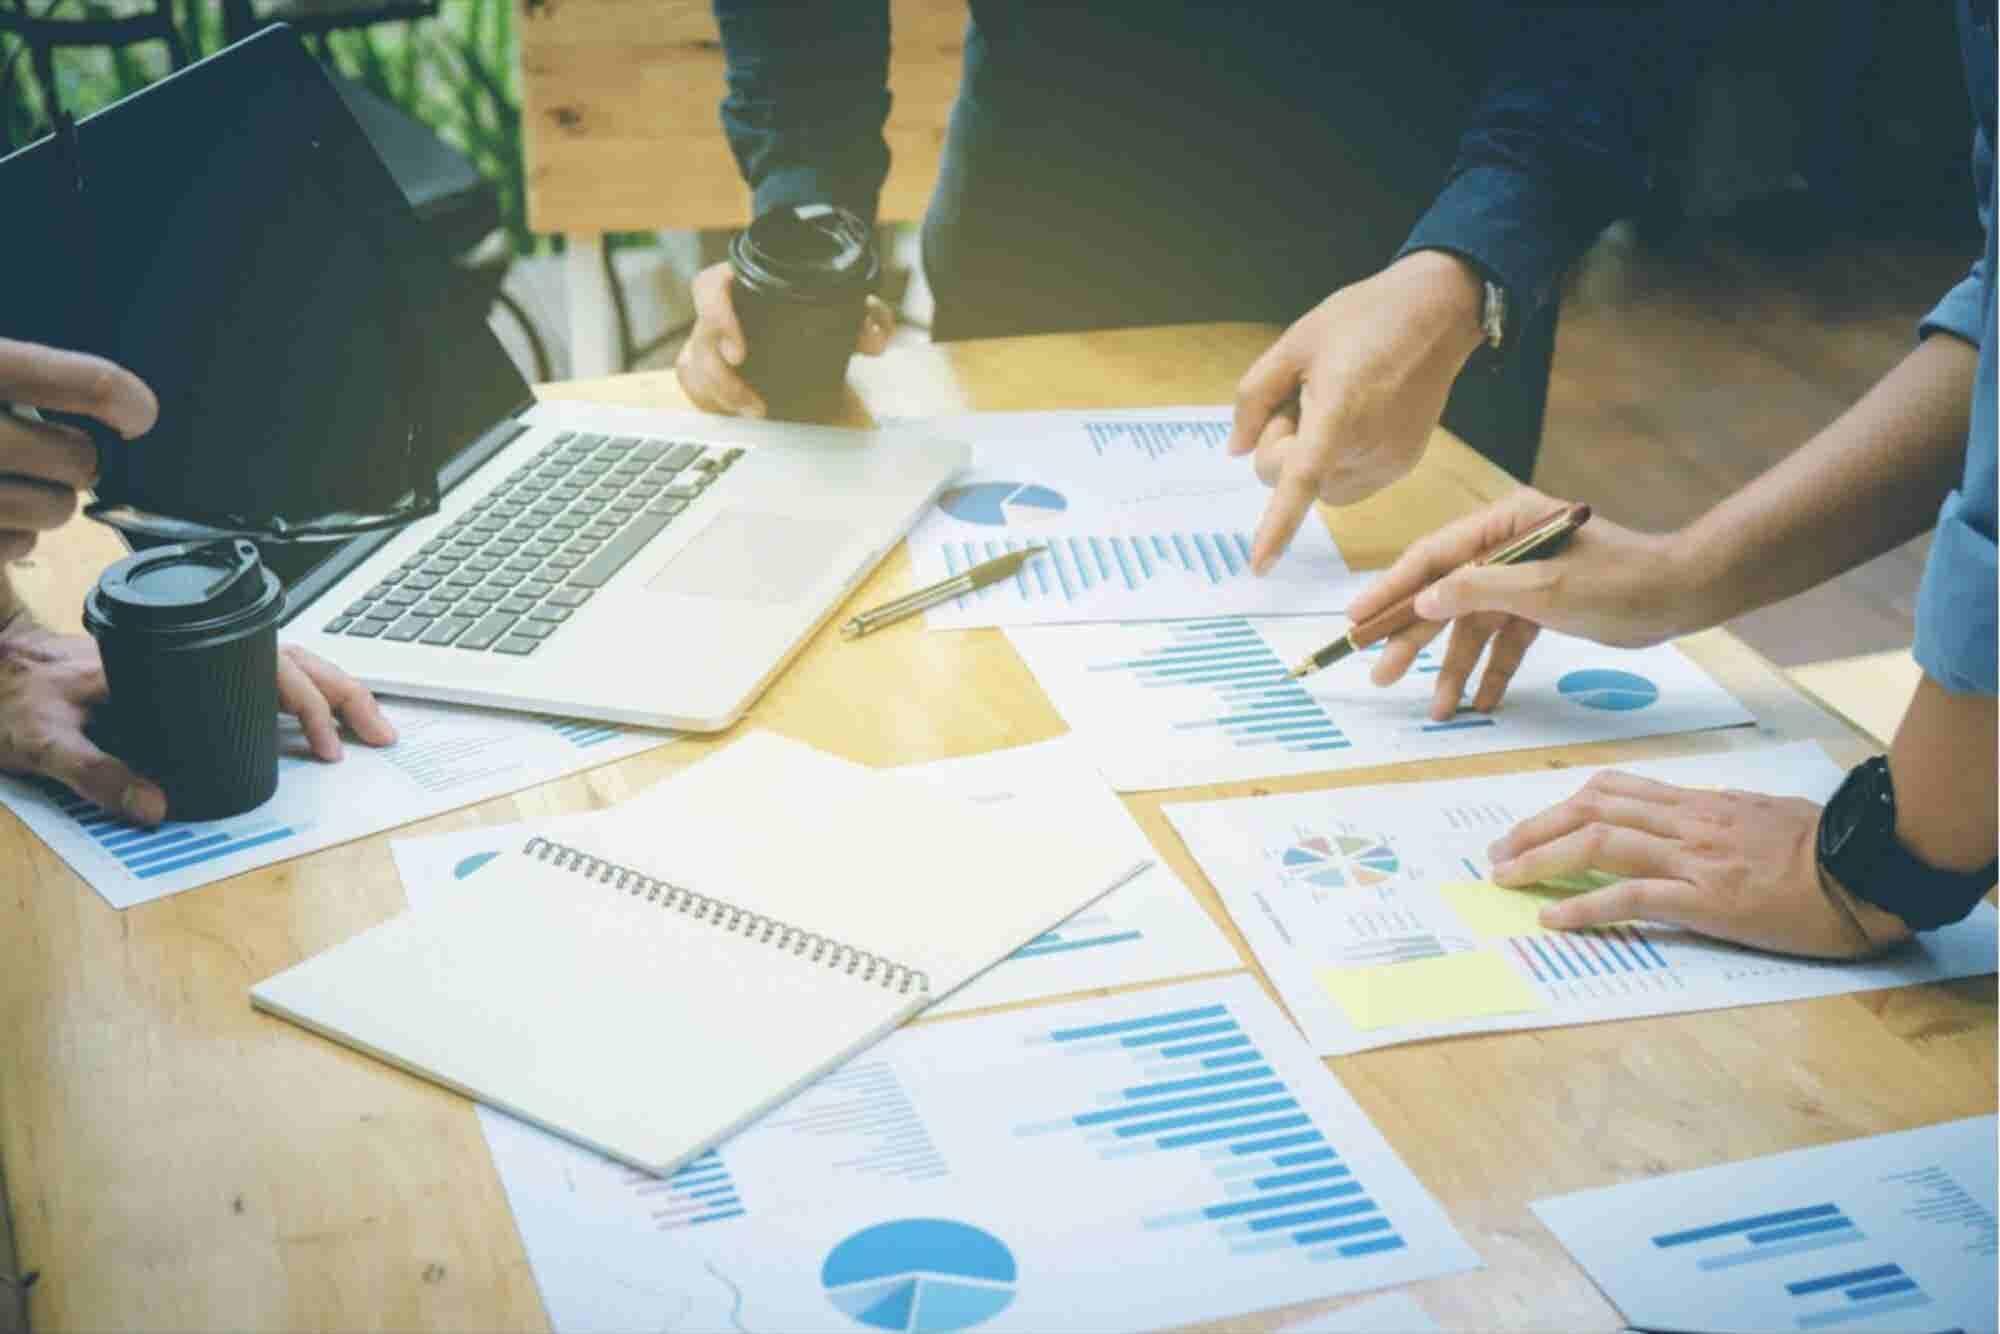 A List of Effective Marketing Secrets for SaaS Start-ups